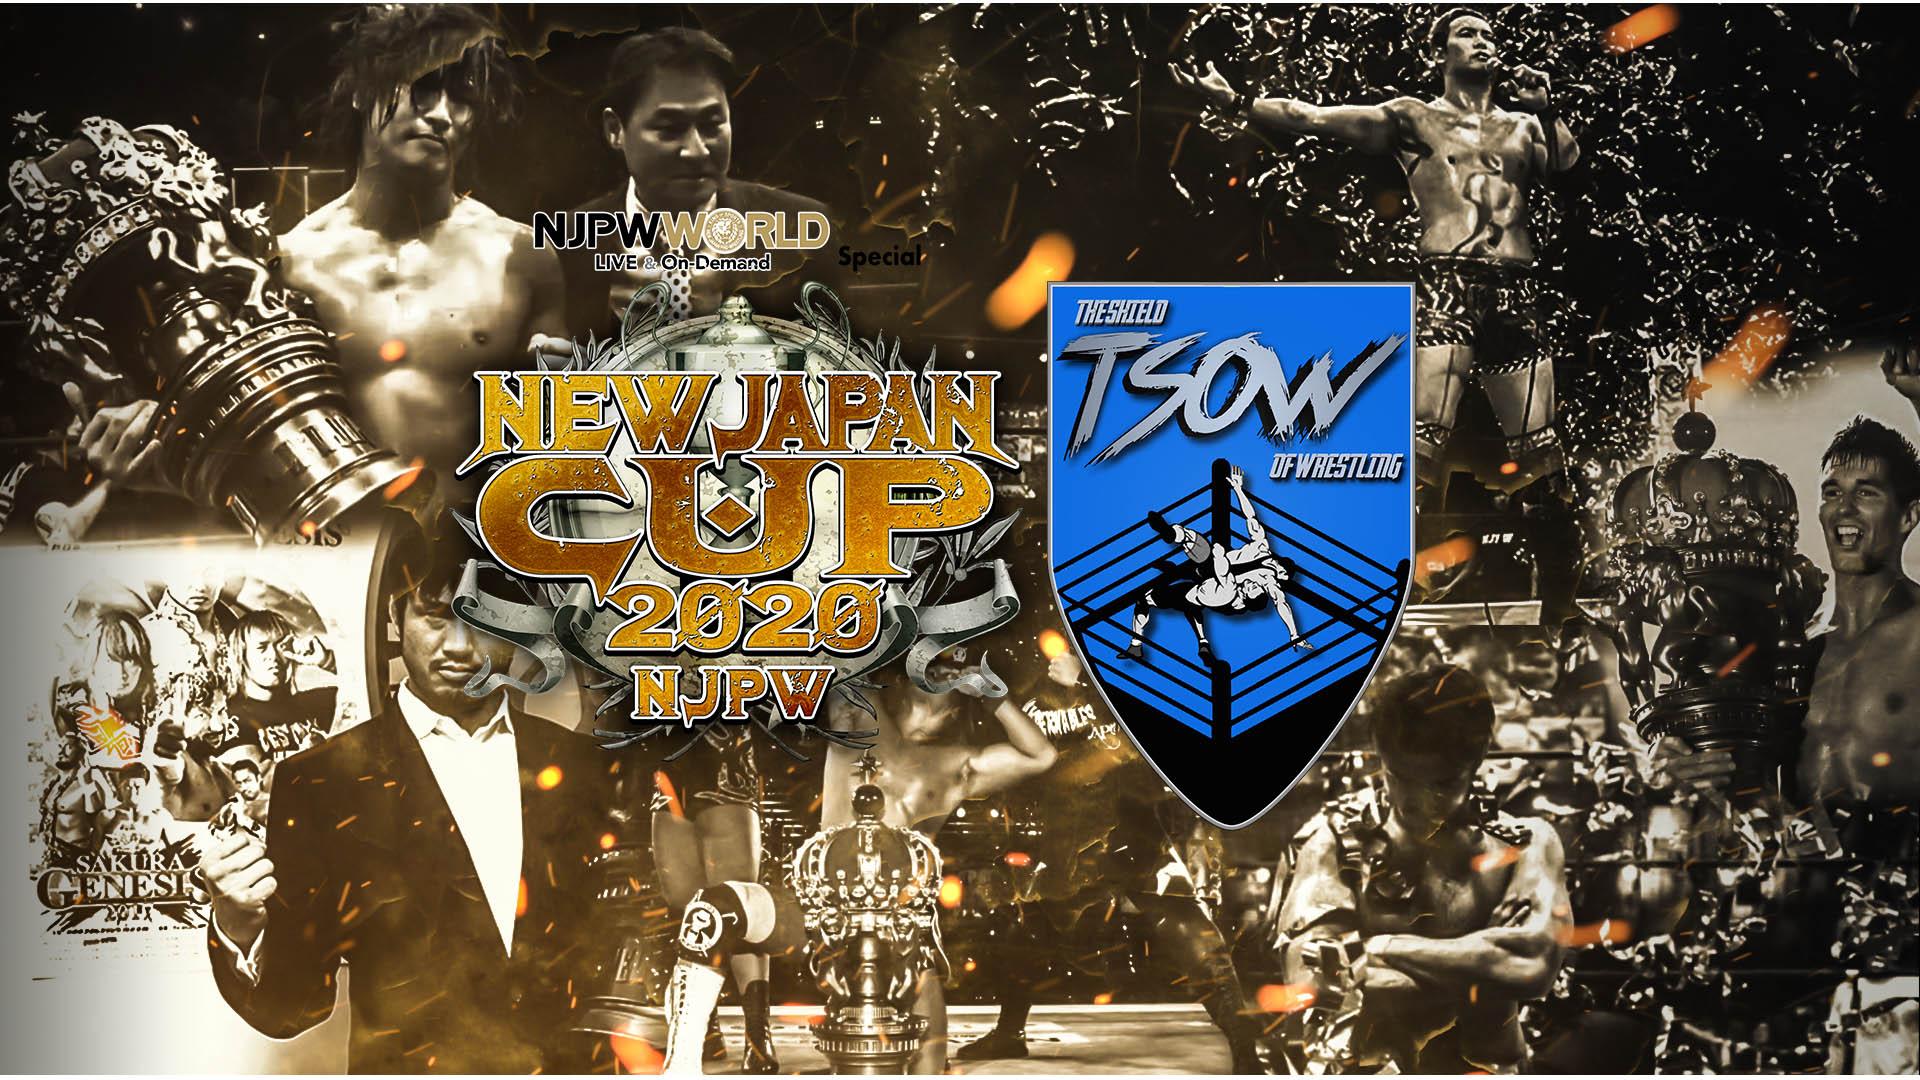 Risultati NJPW NEW JAPAN CUP 2020 Night 3